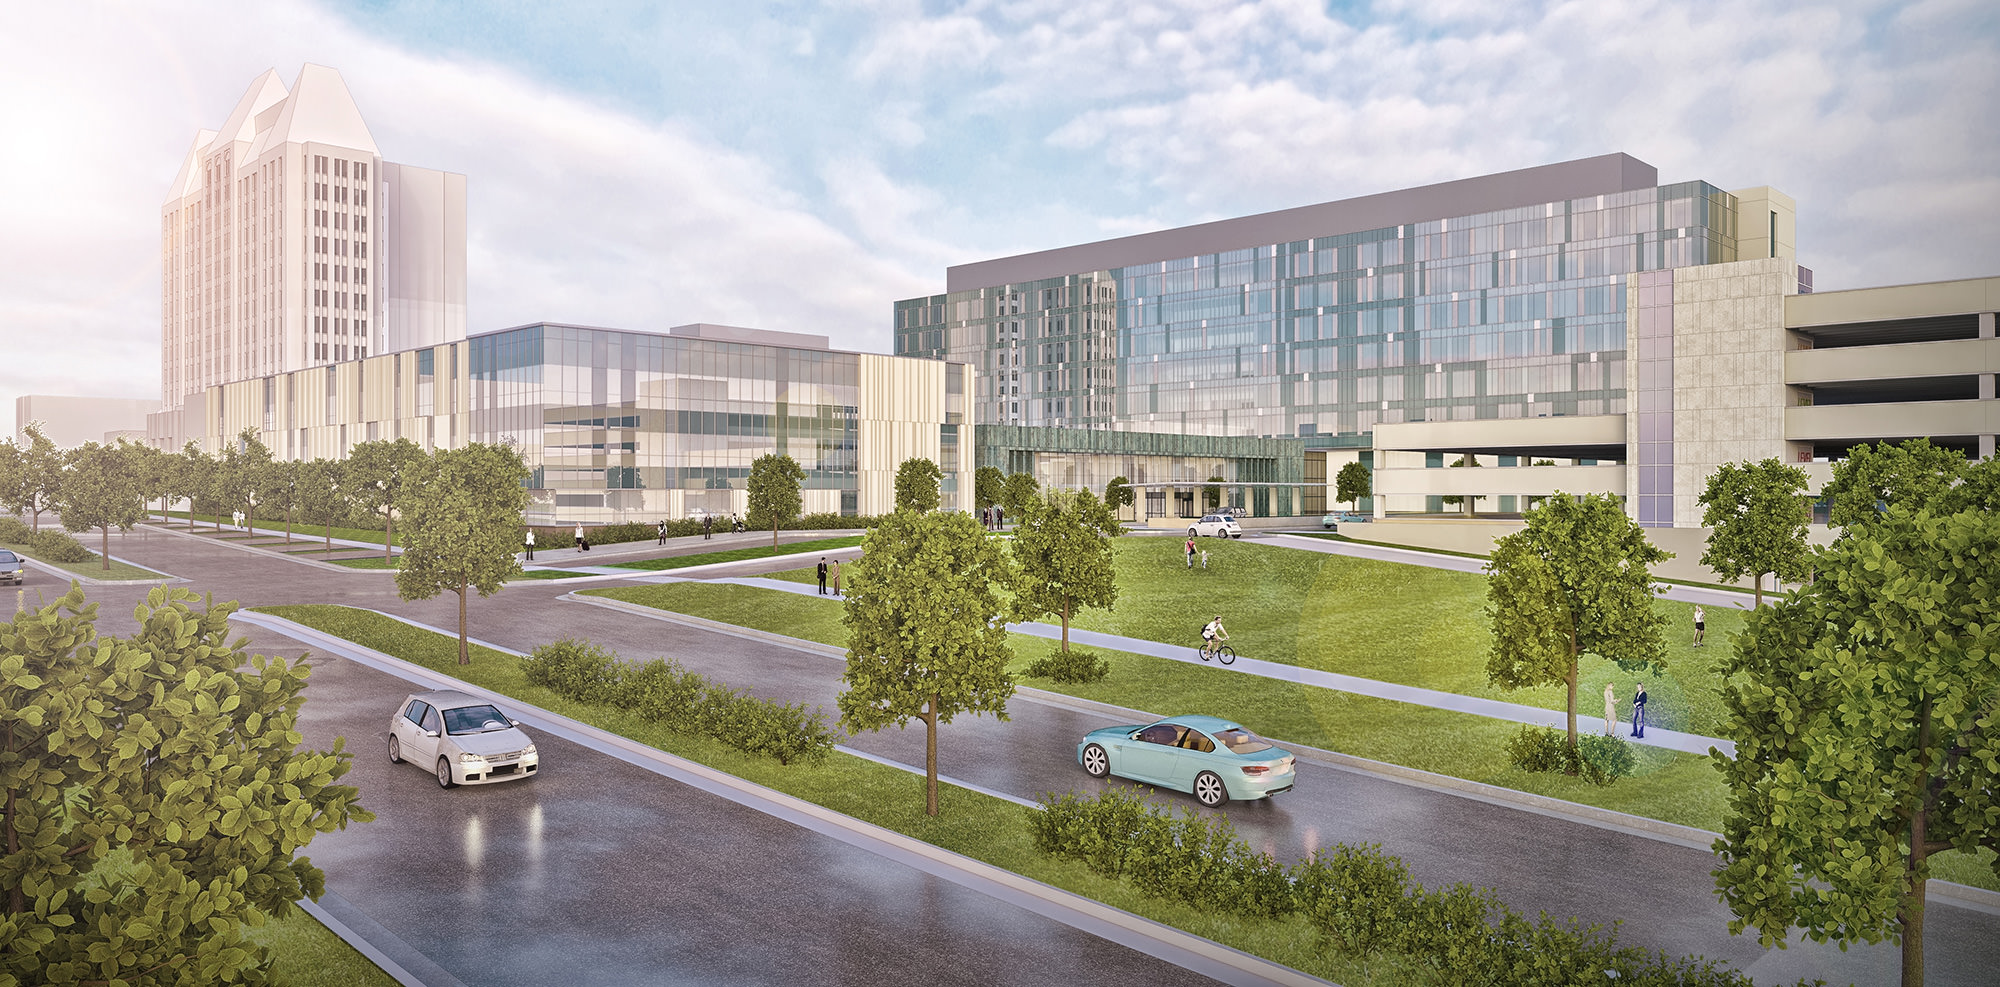 SSM Health Saint Louis University Hospital   Lawrence Group